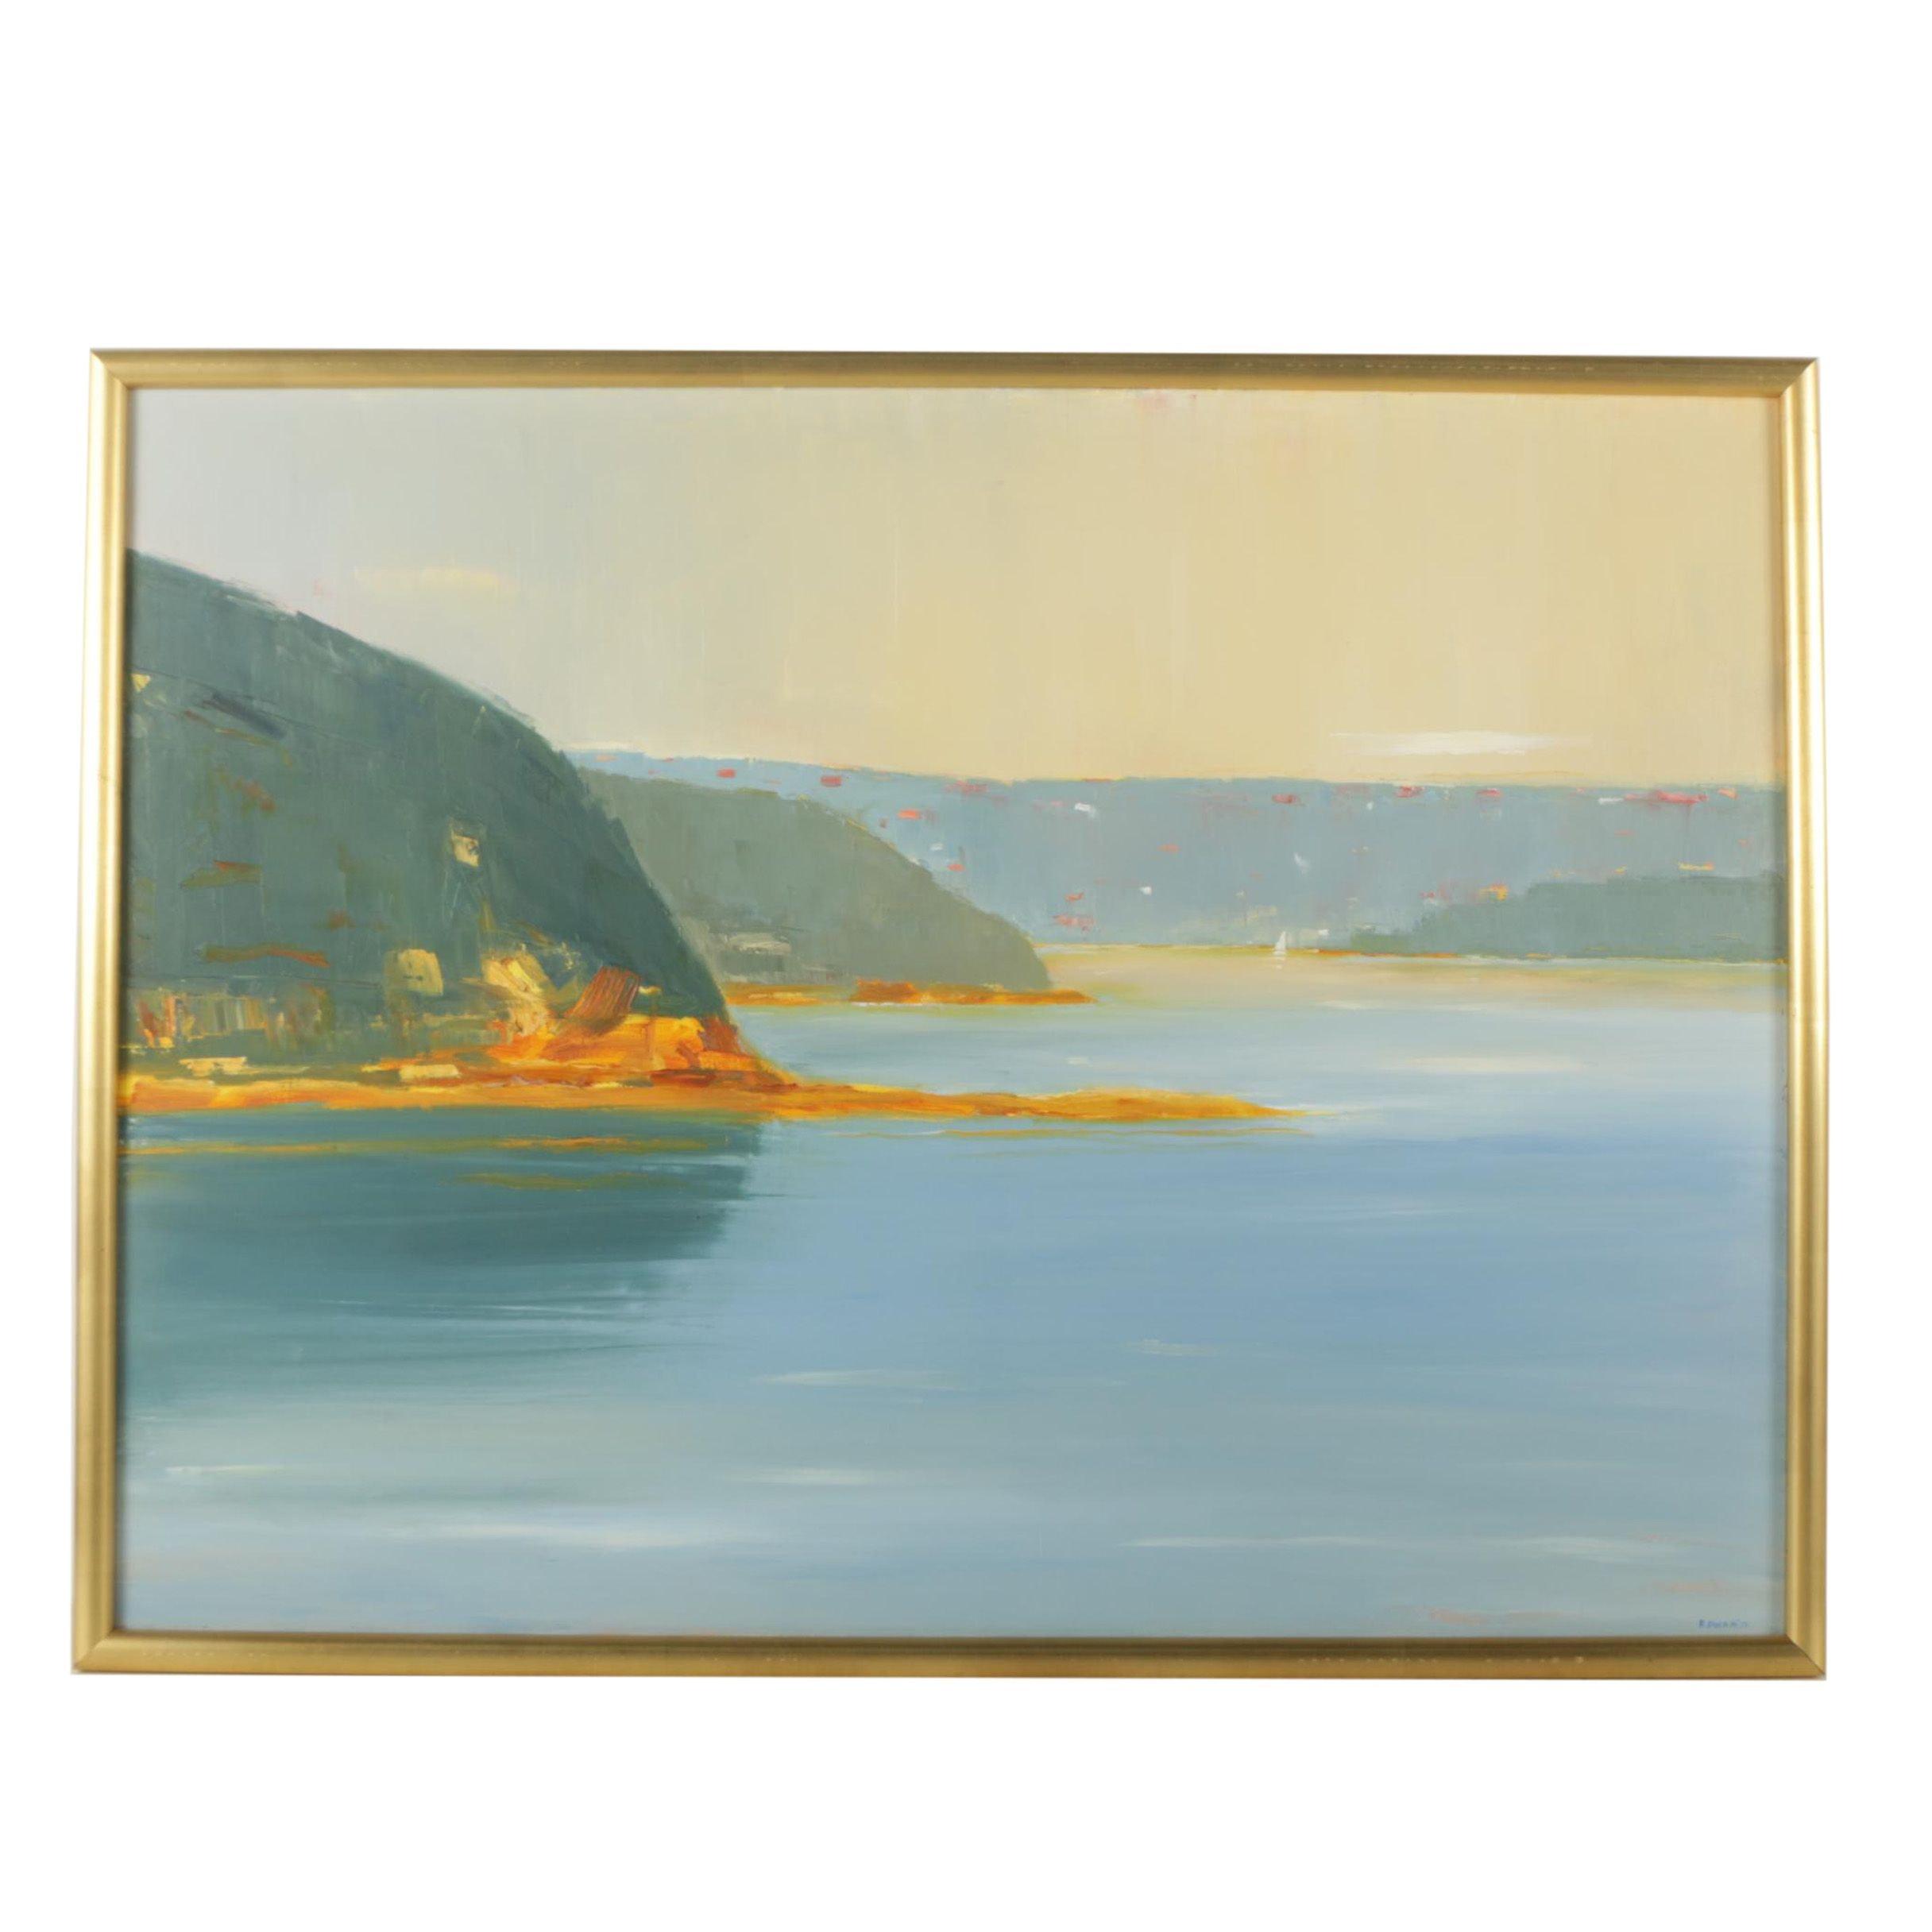 R. Dupain Oil Painting on Canvas Landscape of a Coast